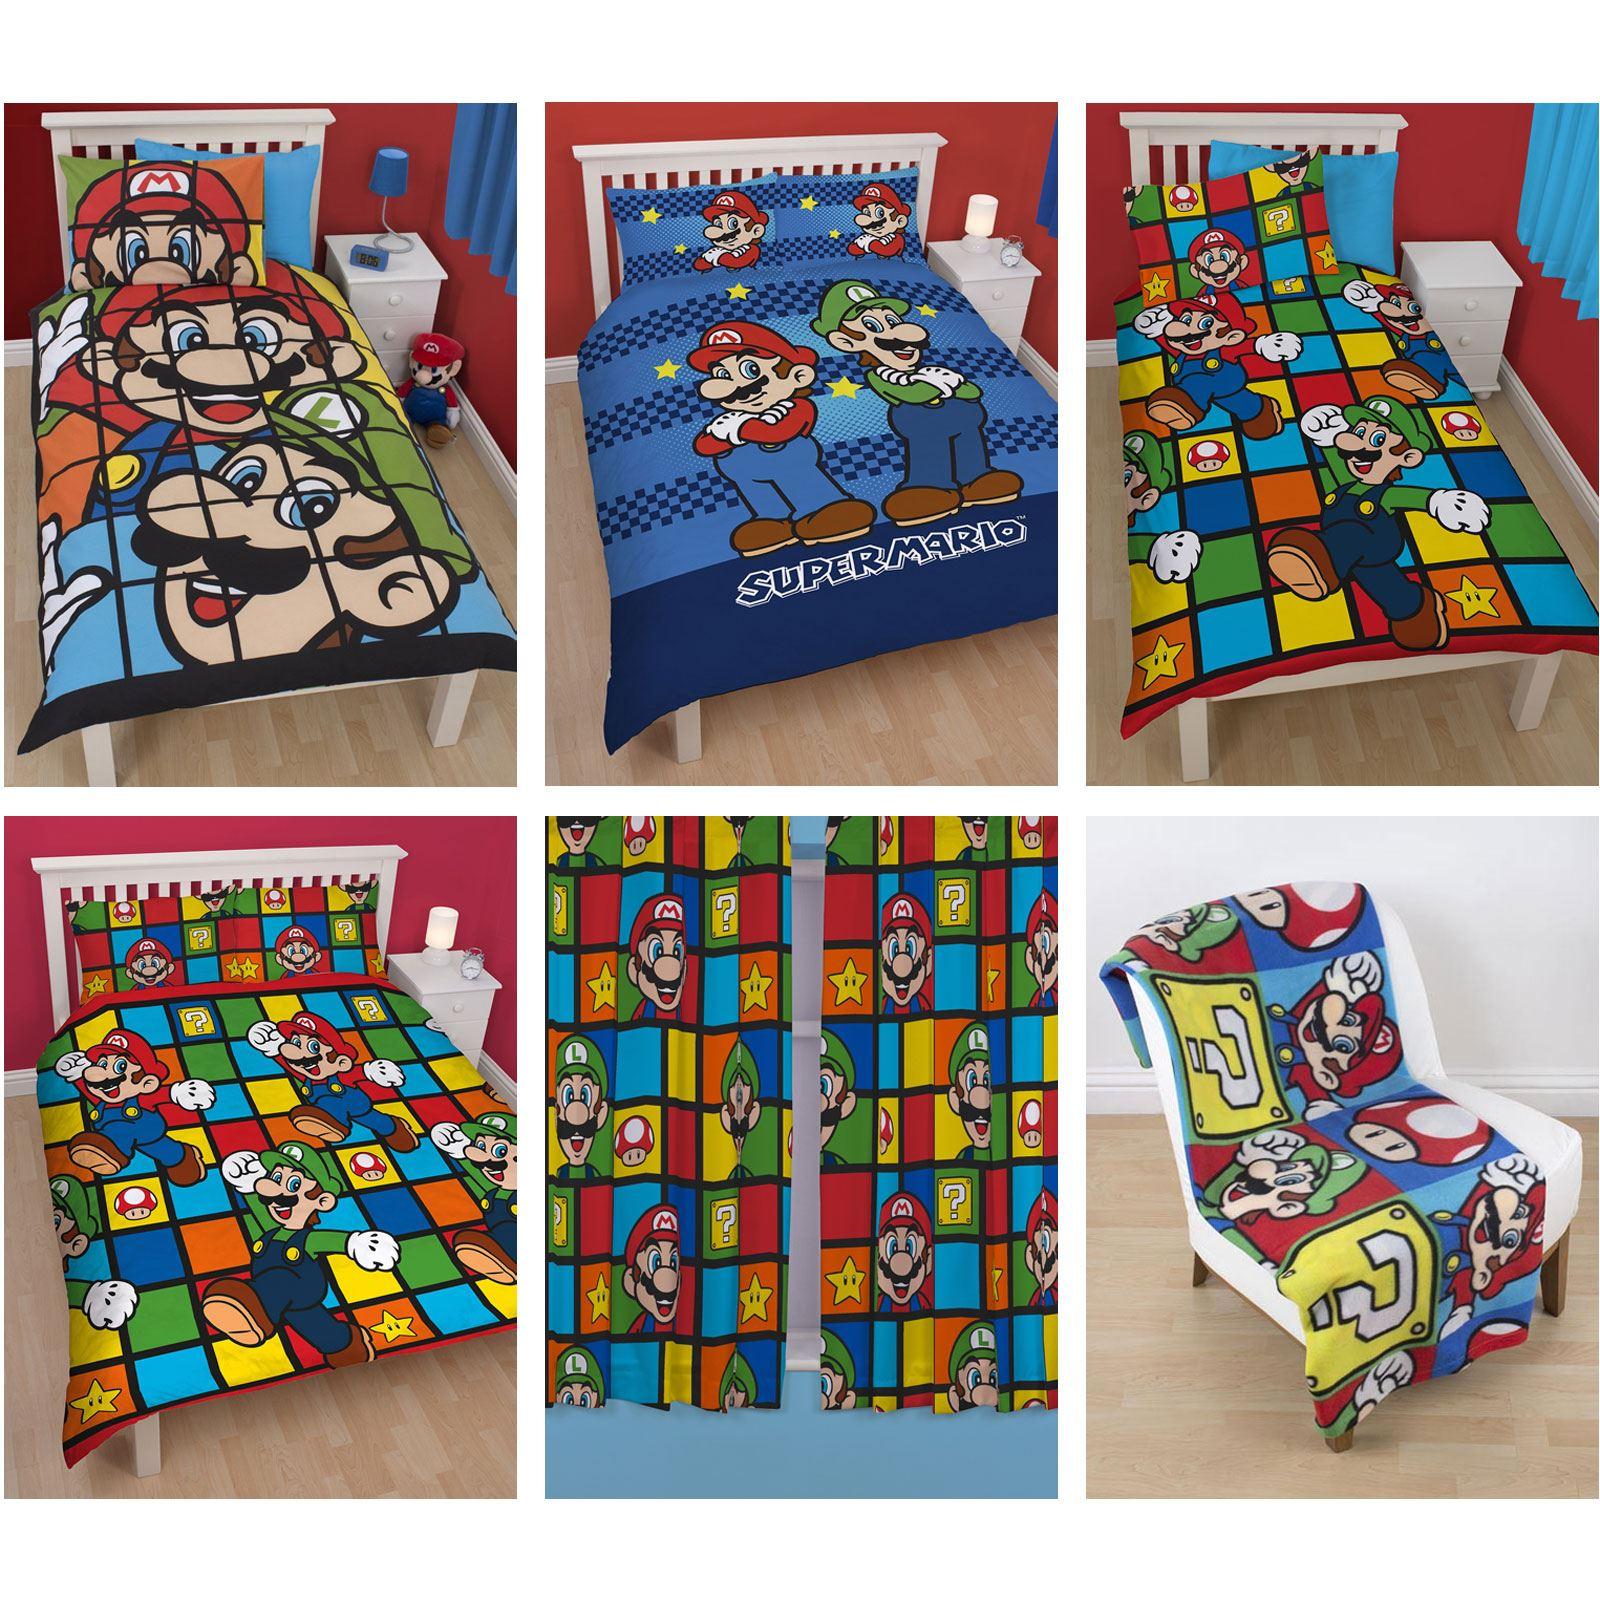 Official Nintendo Super Mario Brothers Bedding Duvet Cover